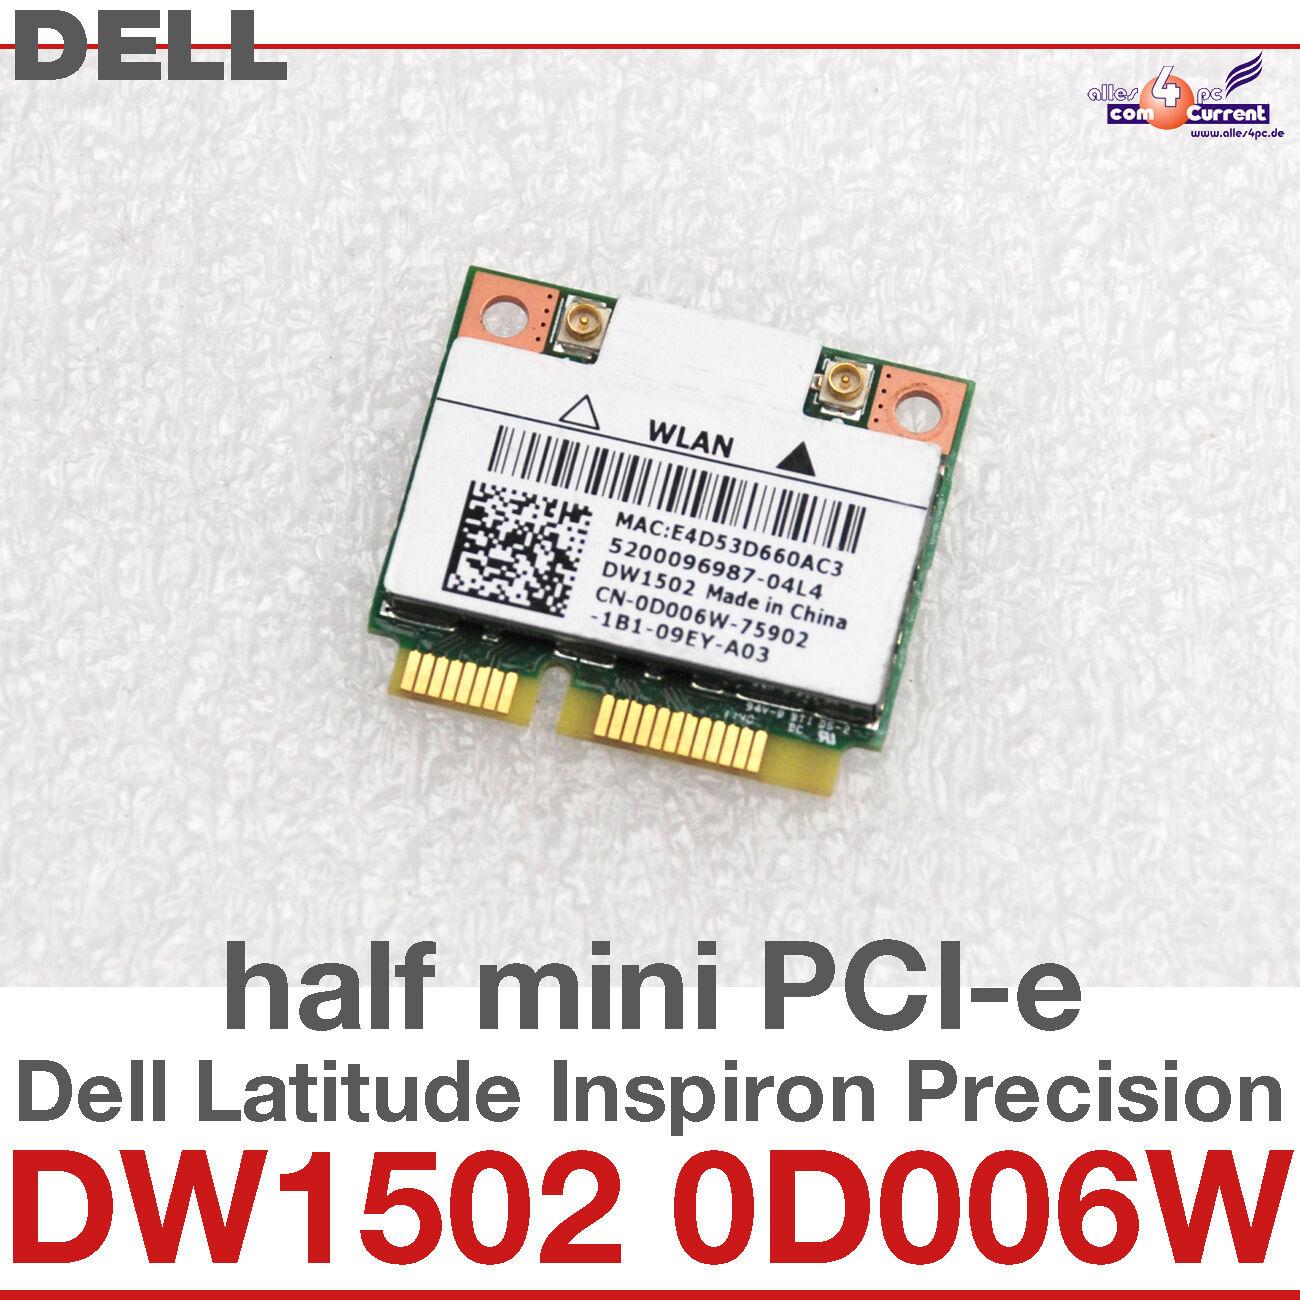 wi-Fi WLAN Wireless Card Network Card Dell Mini Pci-E DW1502 0D006W Atheros D32